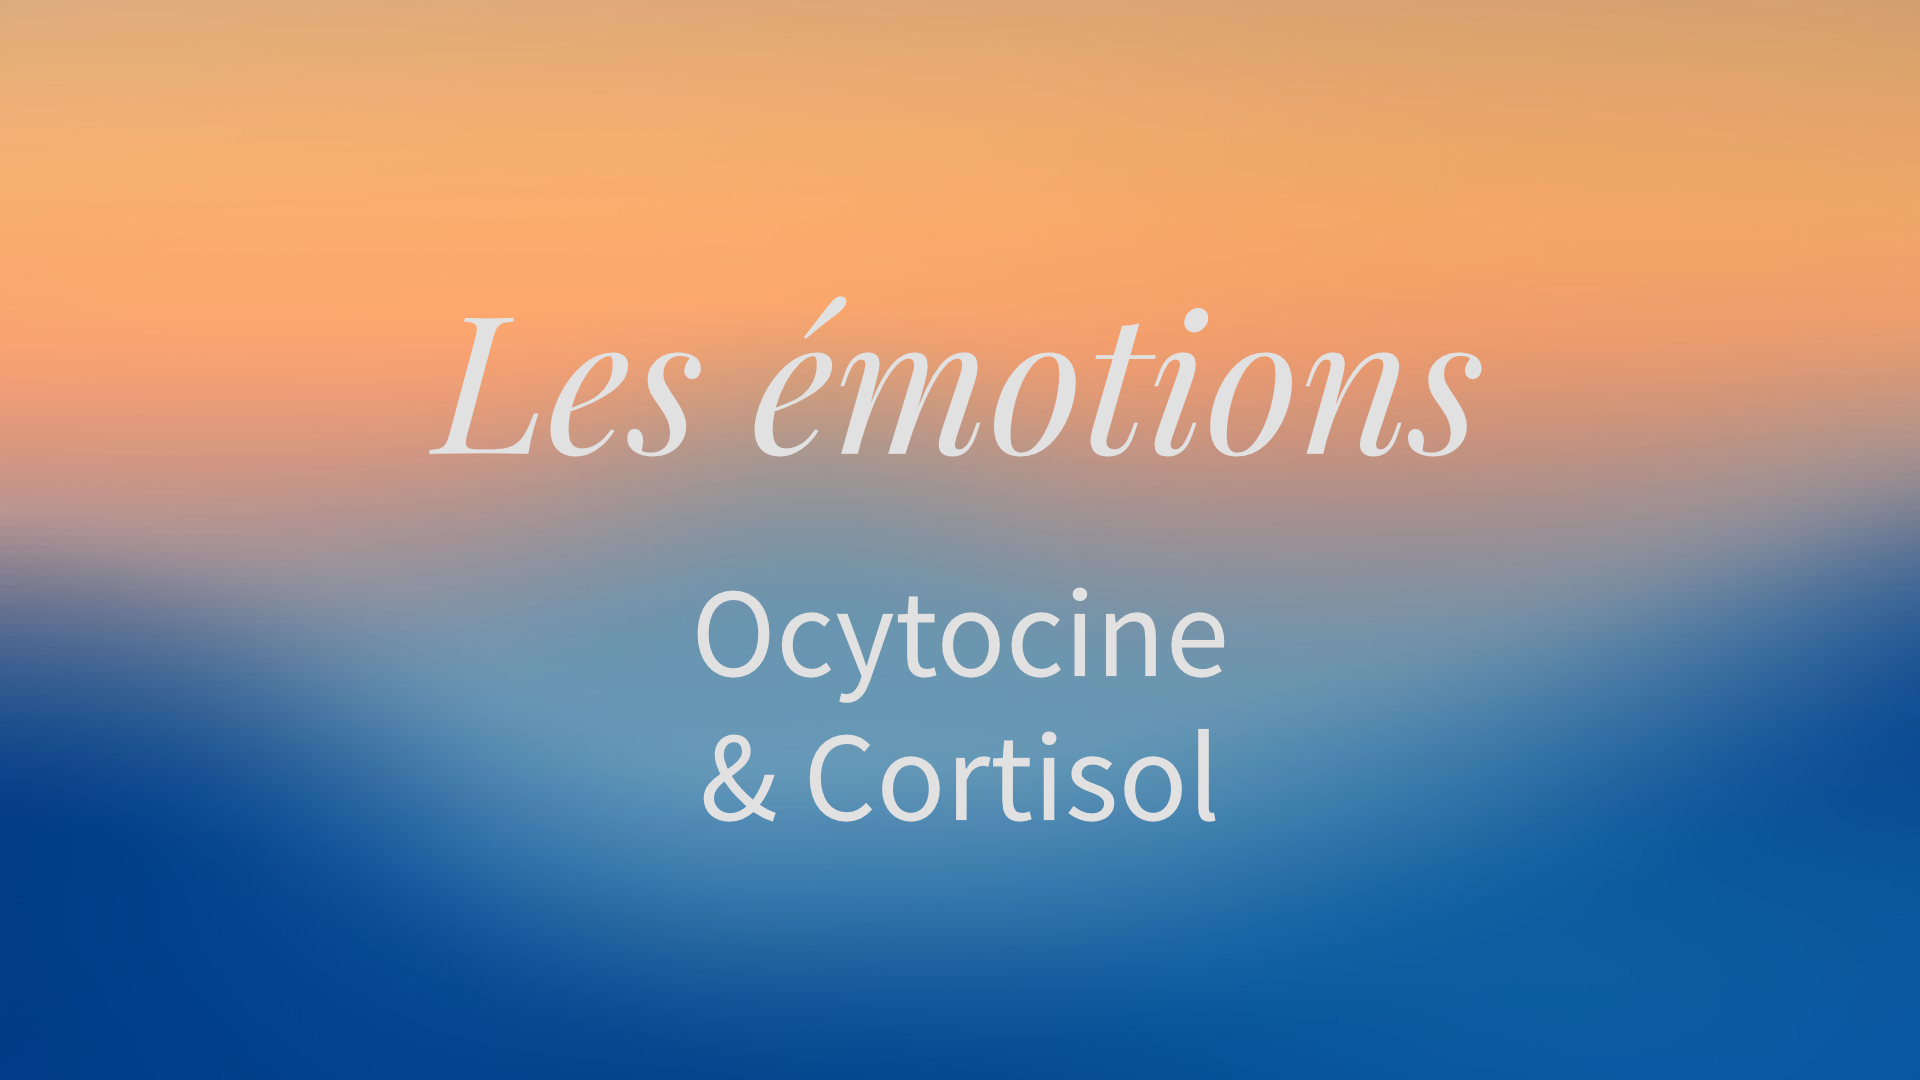 Ocytocine & Cortisol